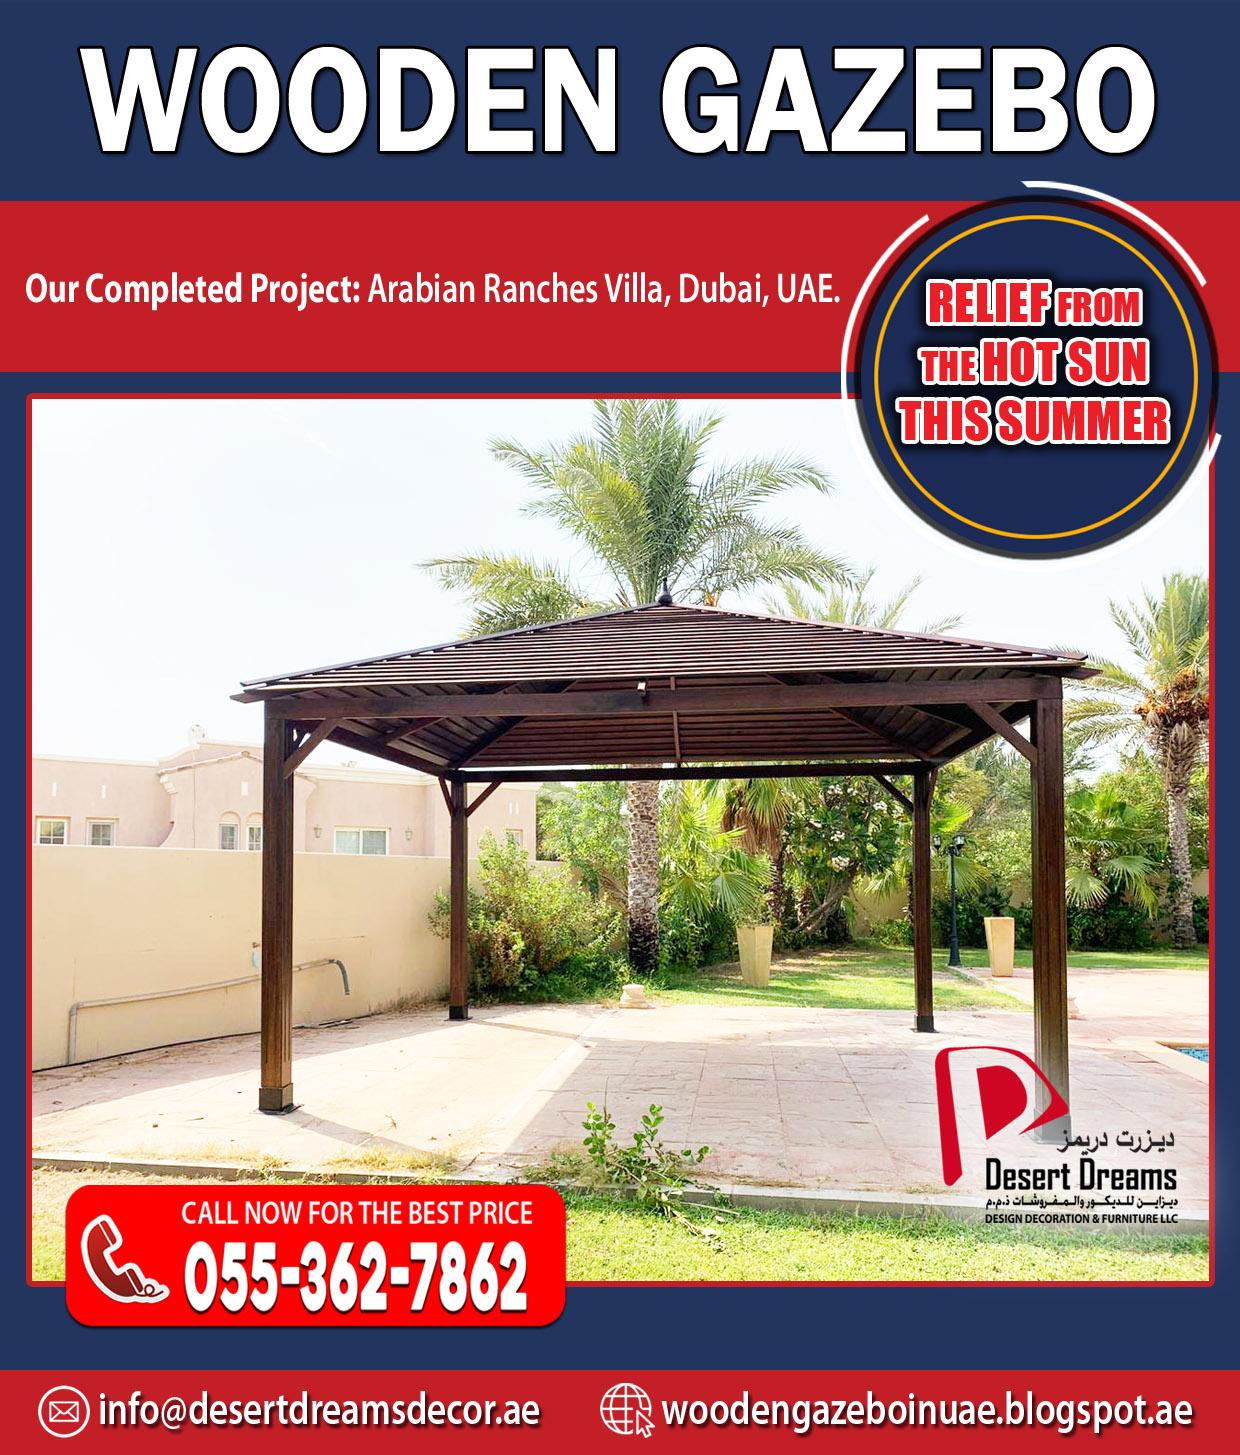 Wooden Gazebo in Dubai, UAE-2.jpg